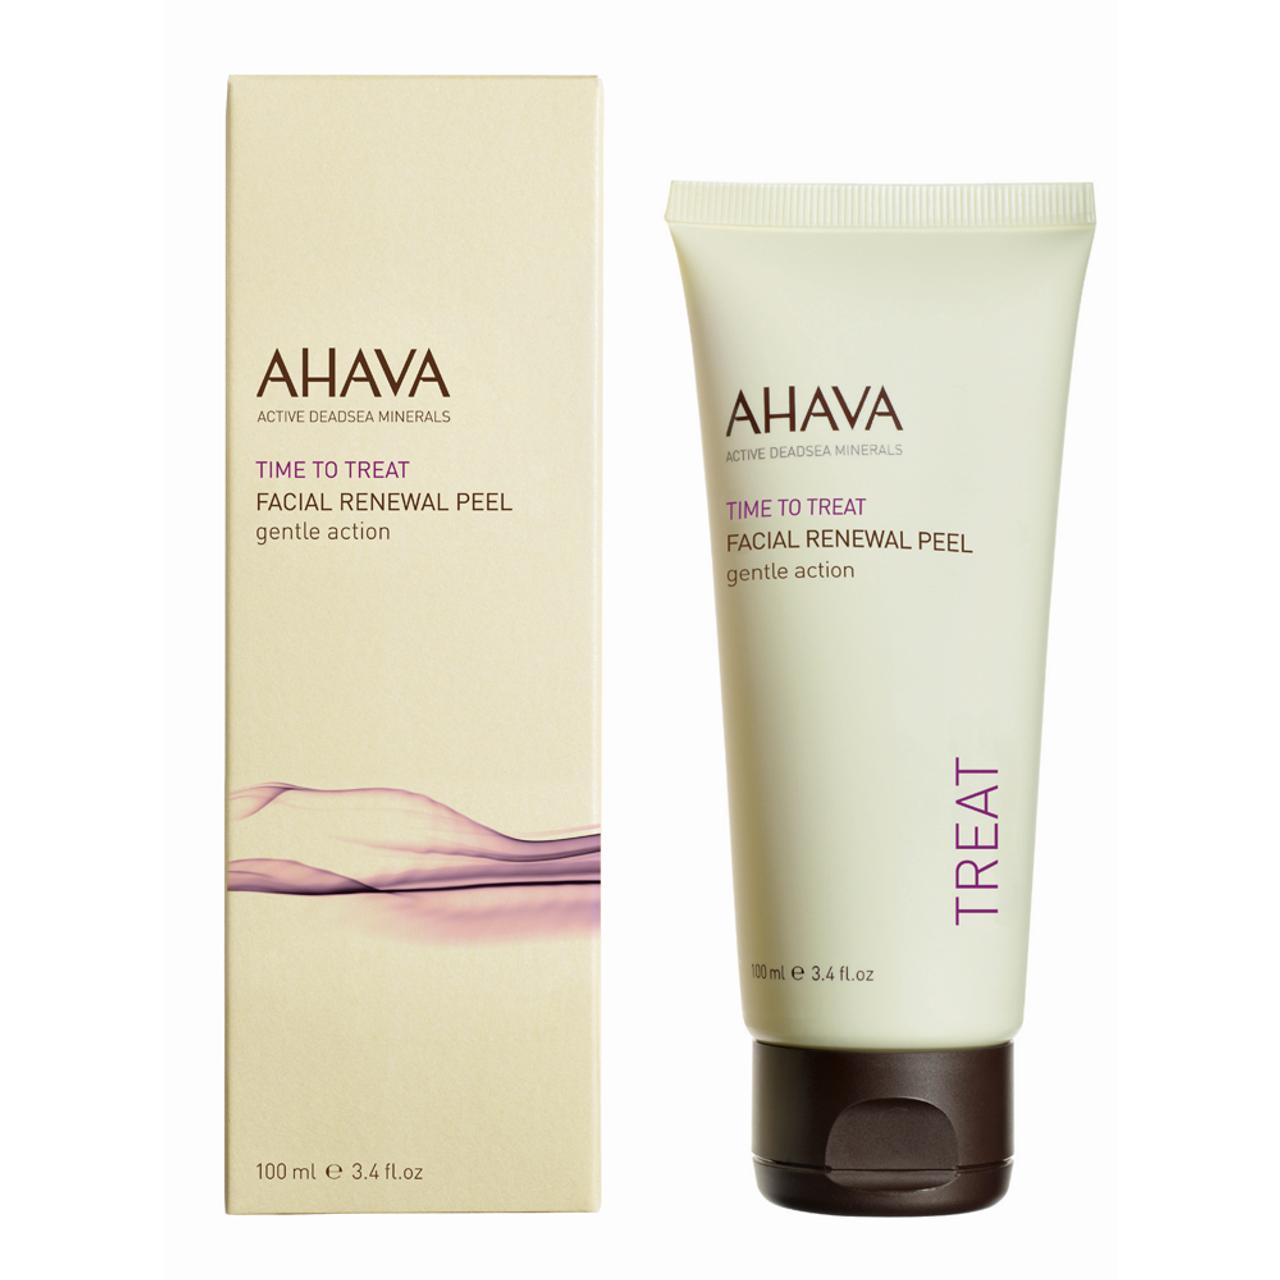 AHAVA Facial Renewal Peel